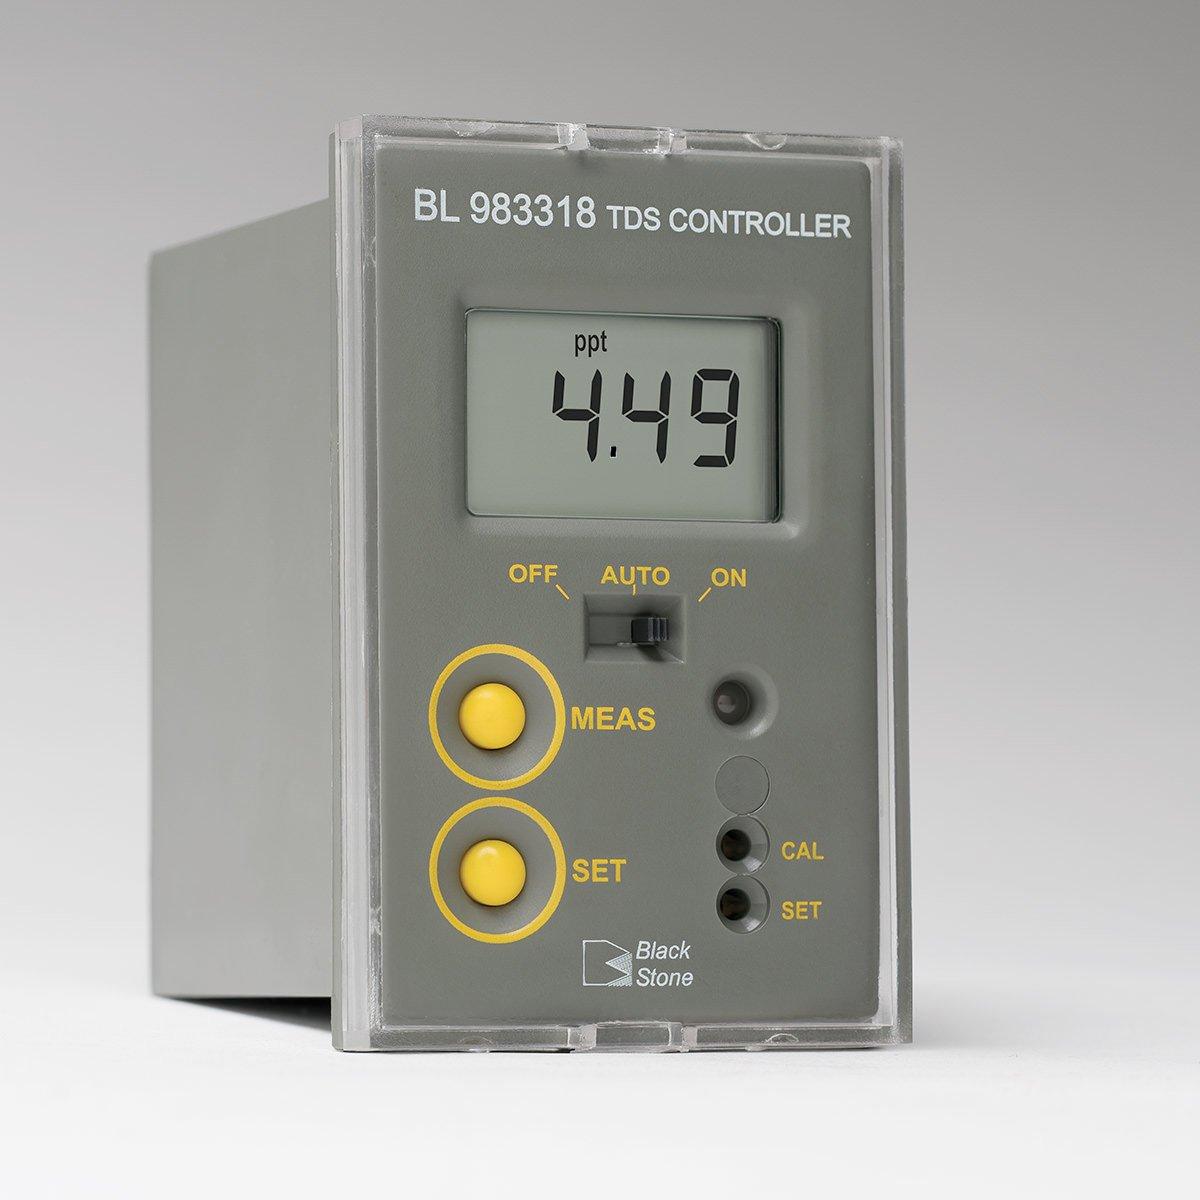 tds-mini-controller-bl983318-side